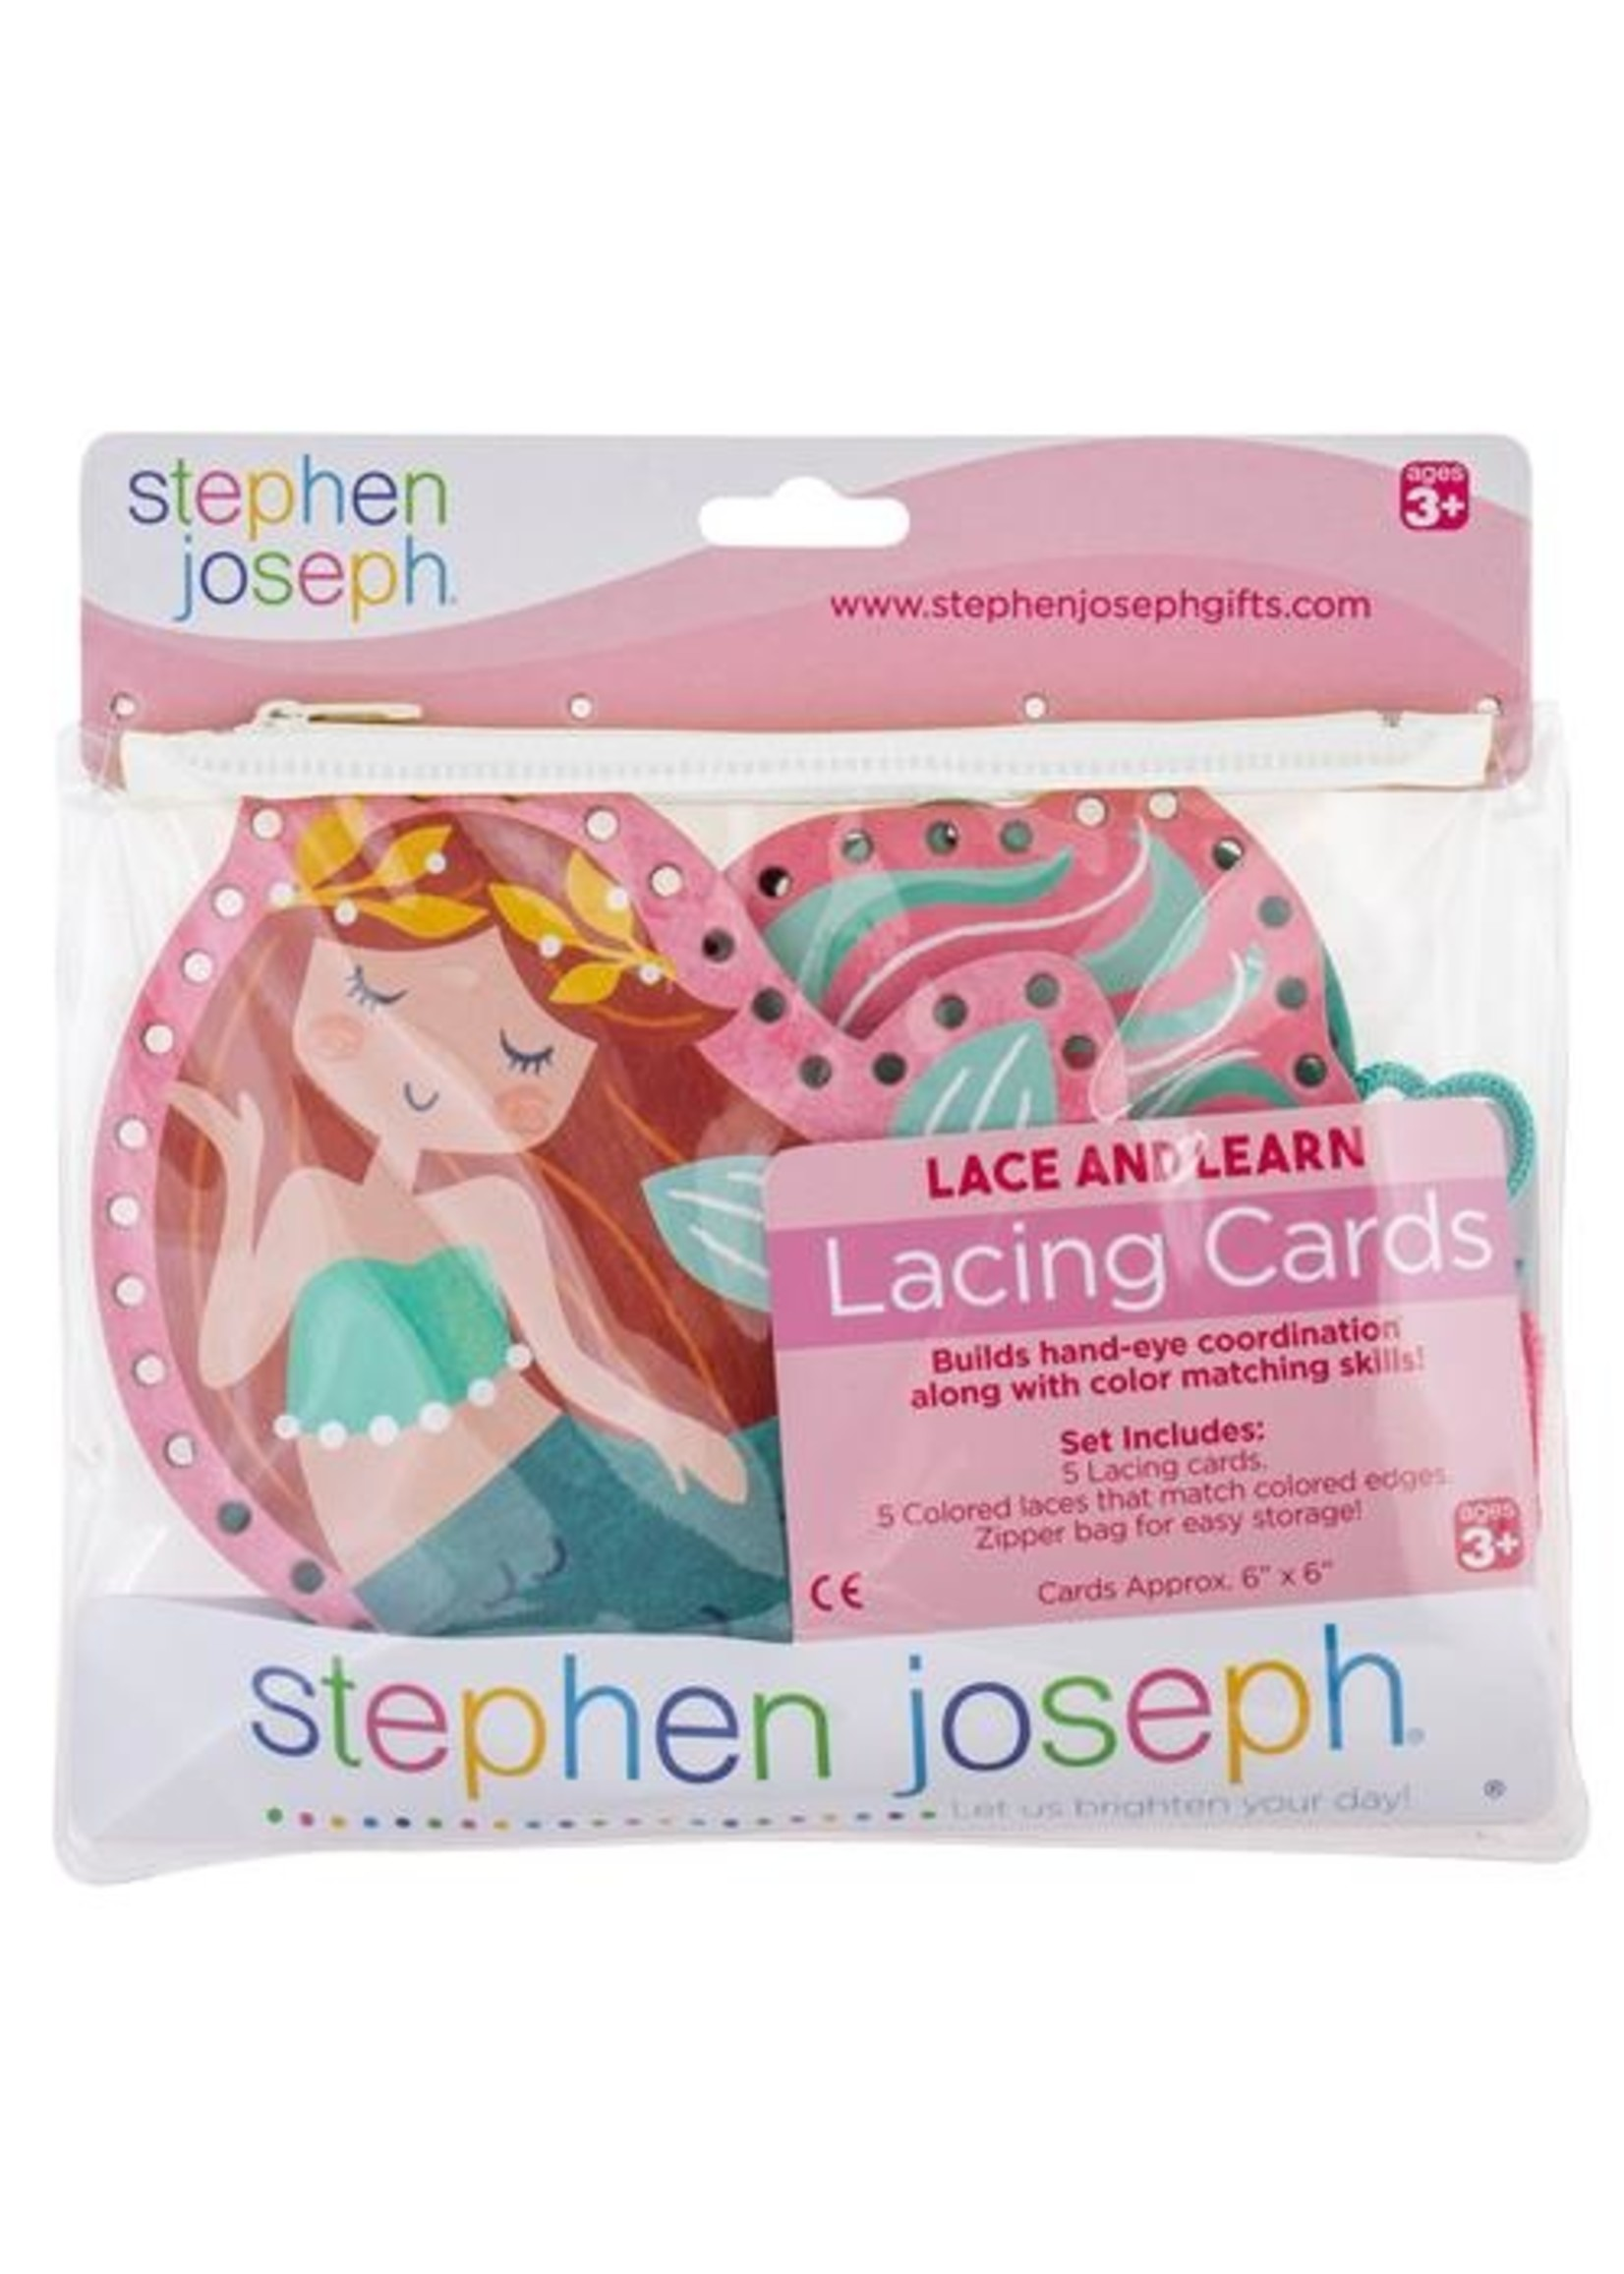 stephen joseph Lacing Cards - Mermaid